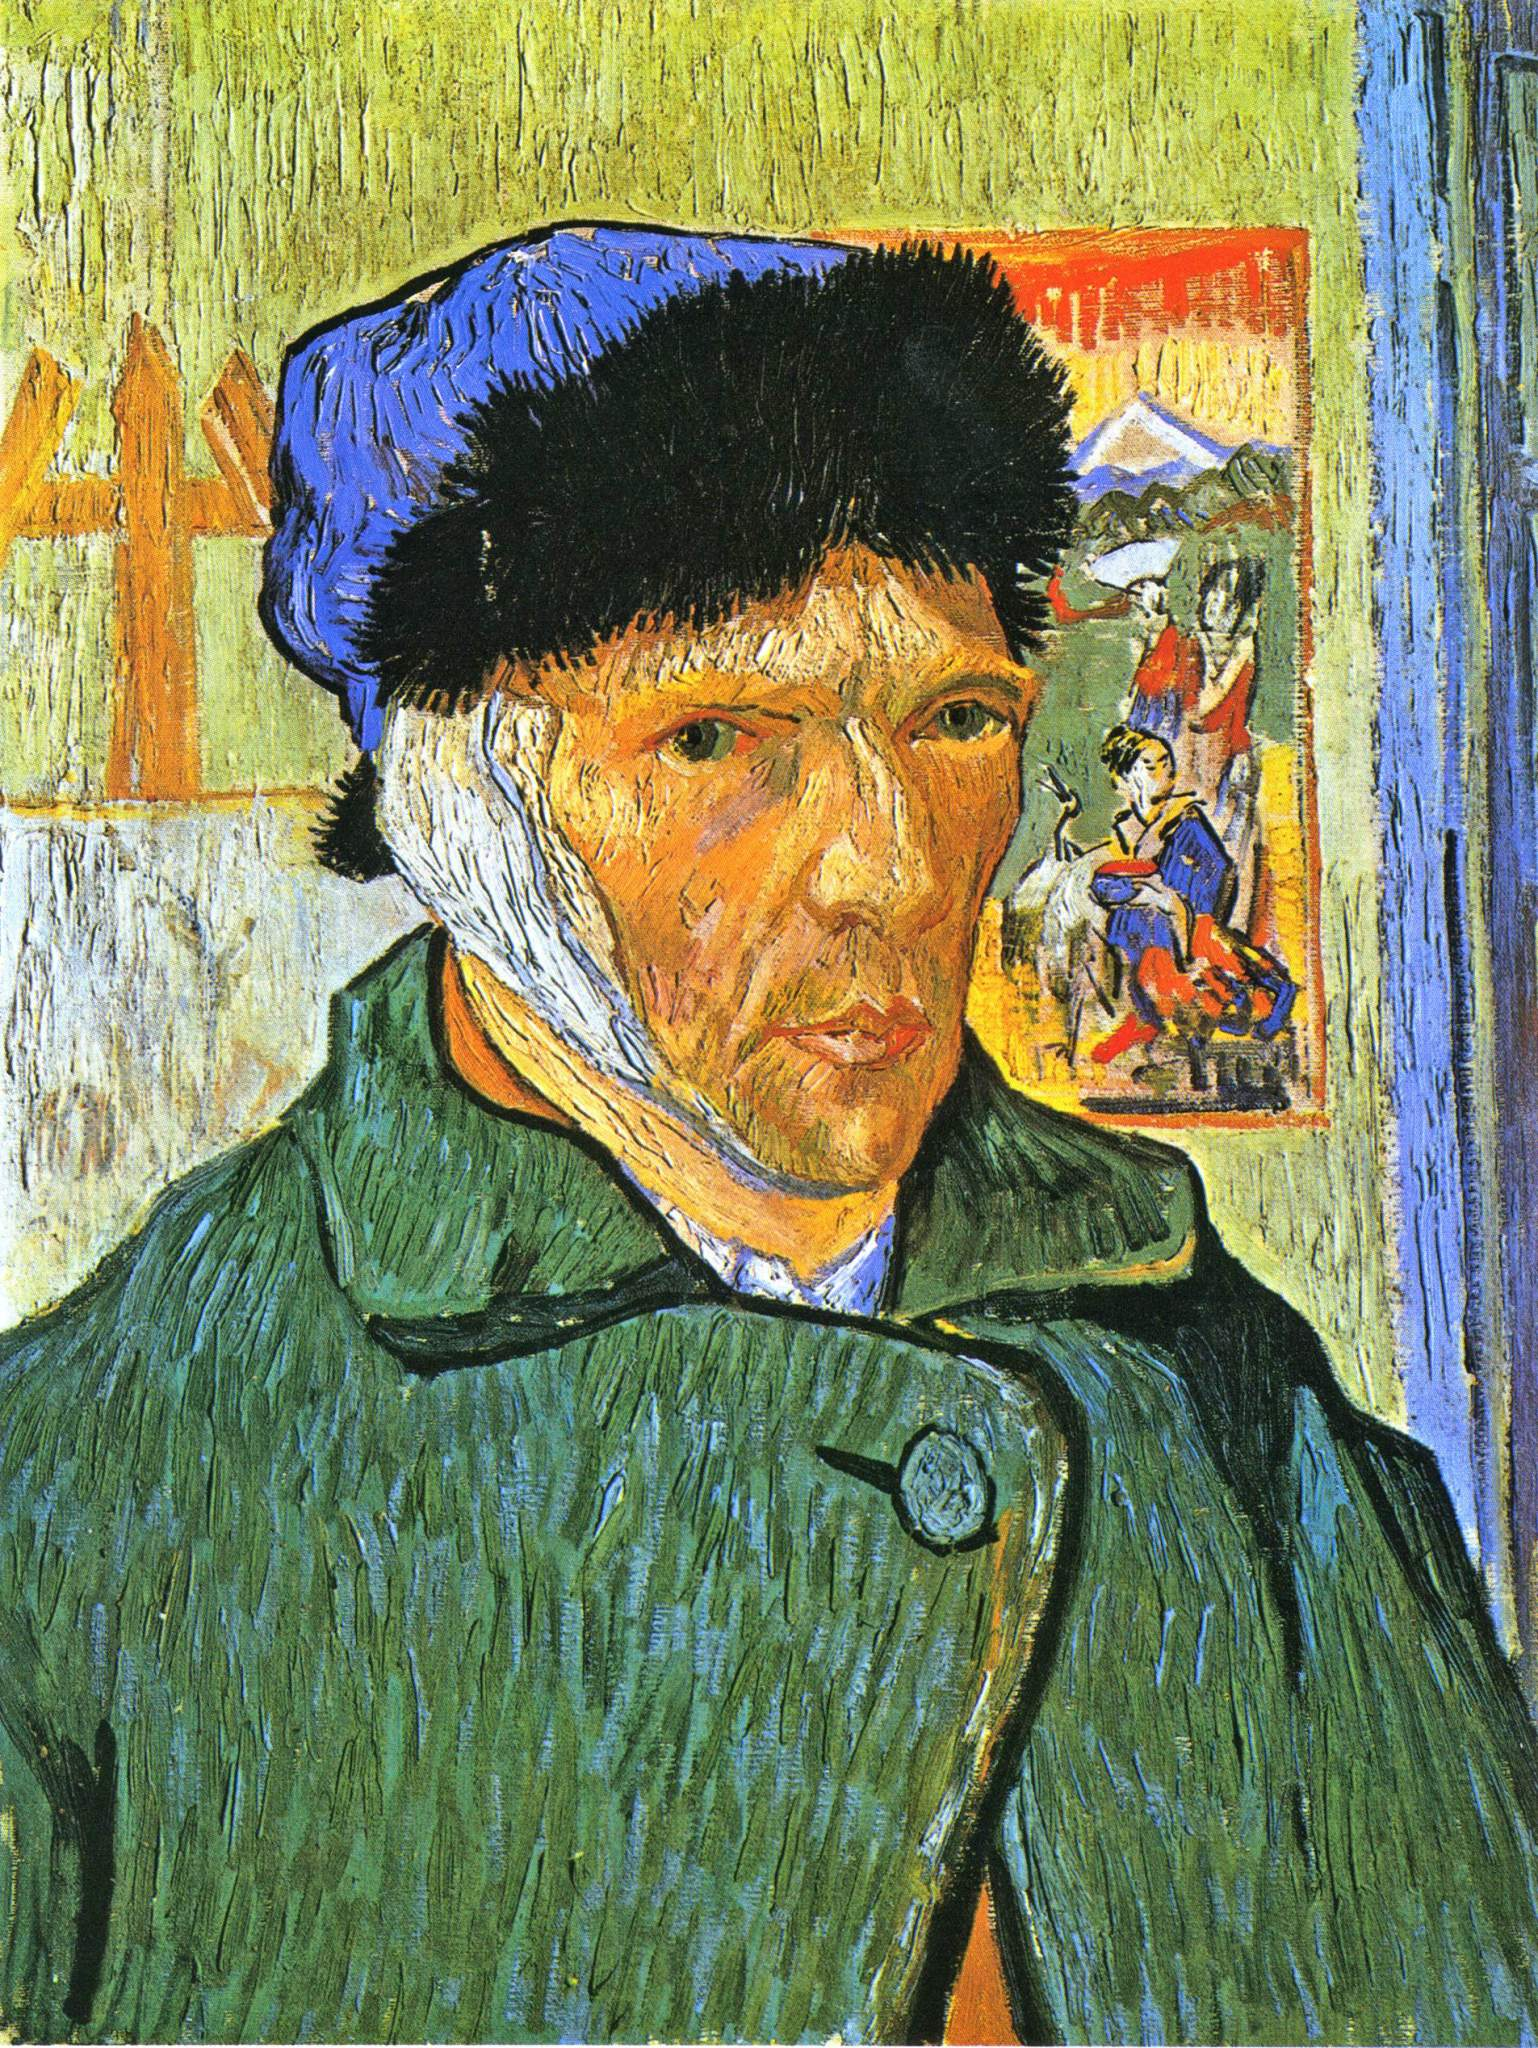 Dutch Masters Season Part 1 Van Gogh